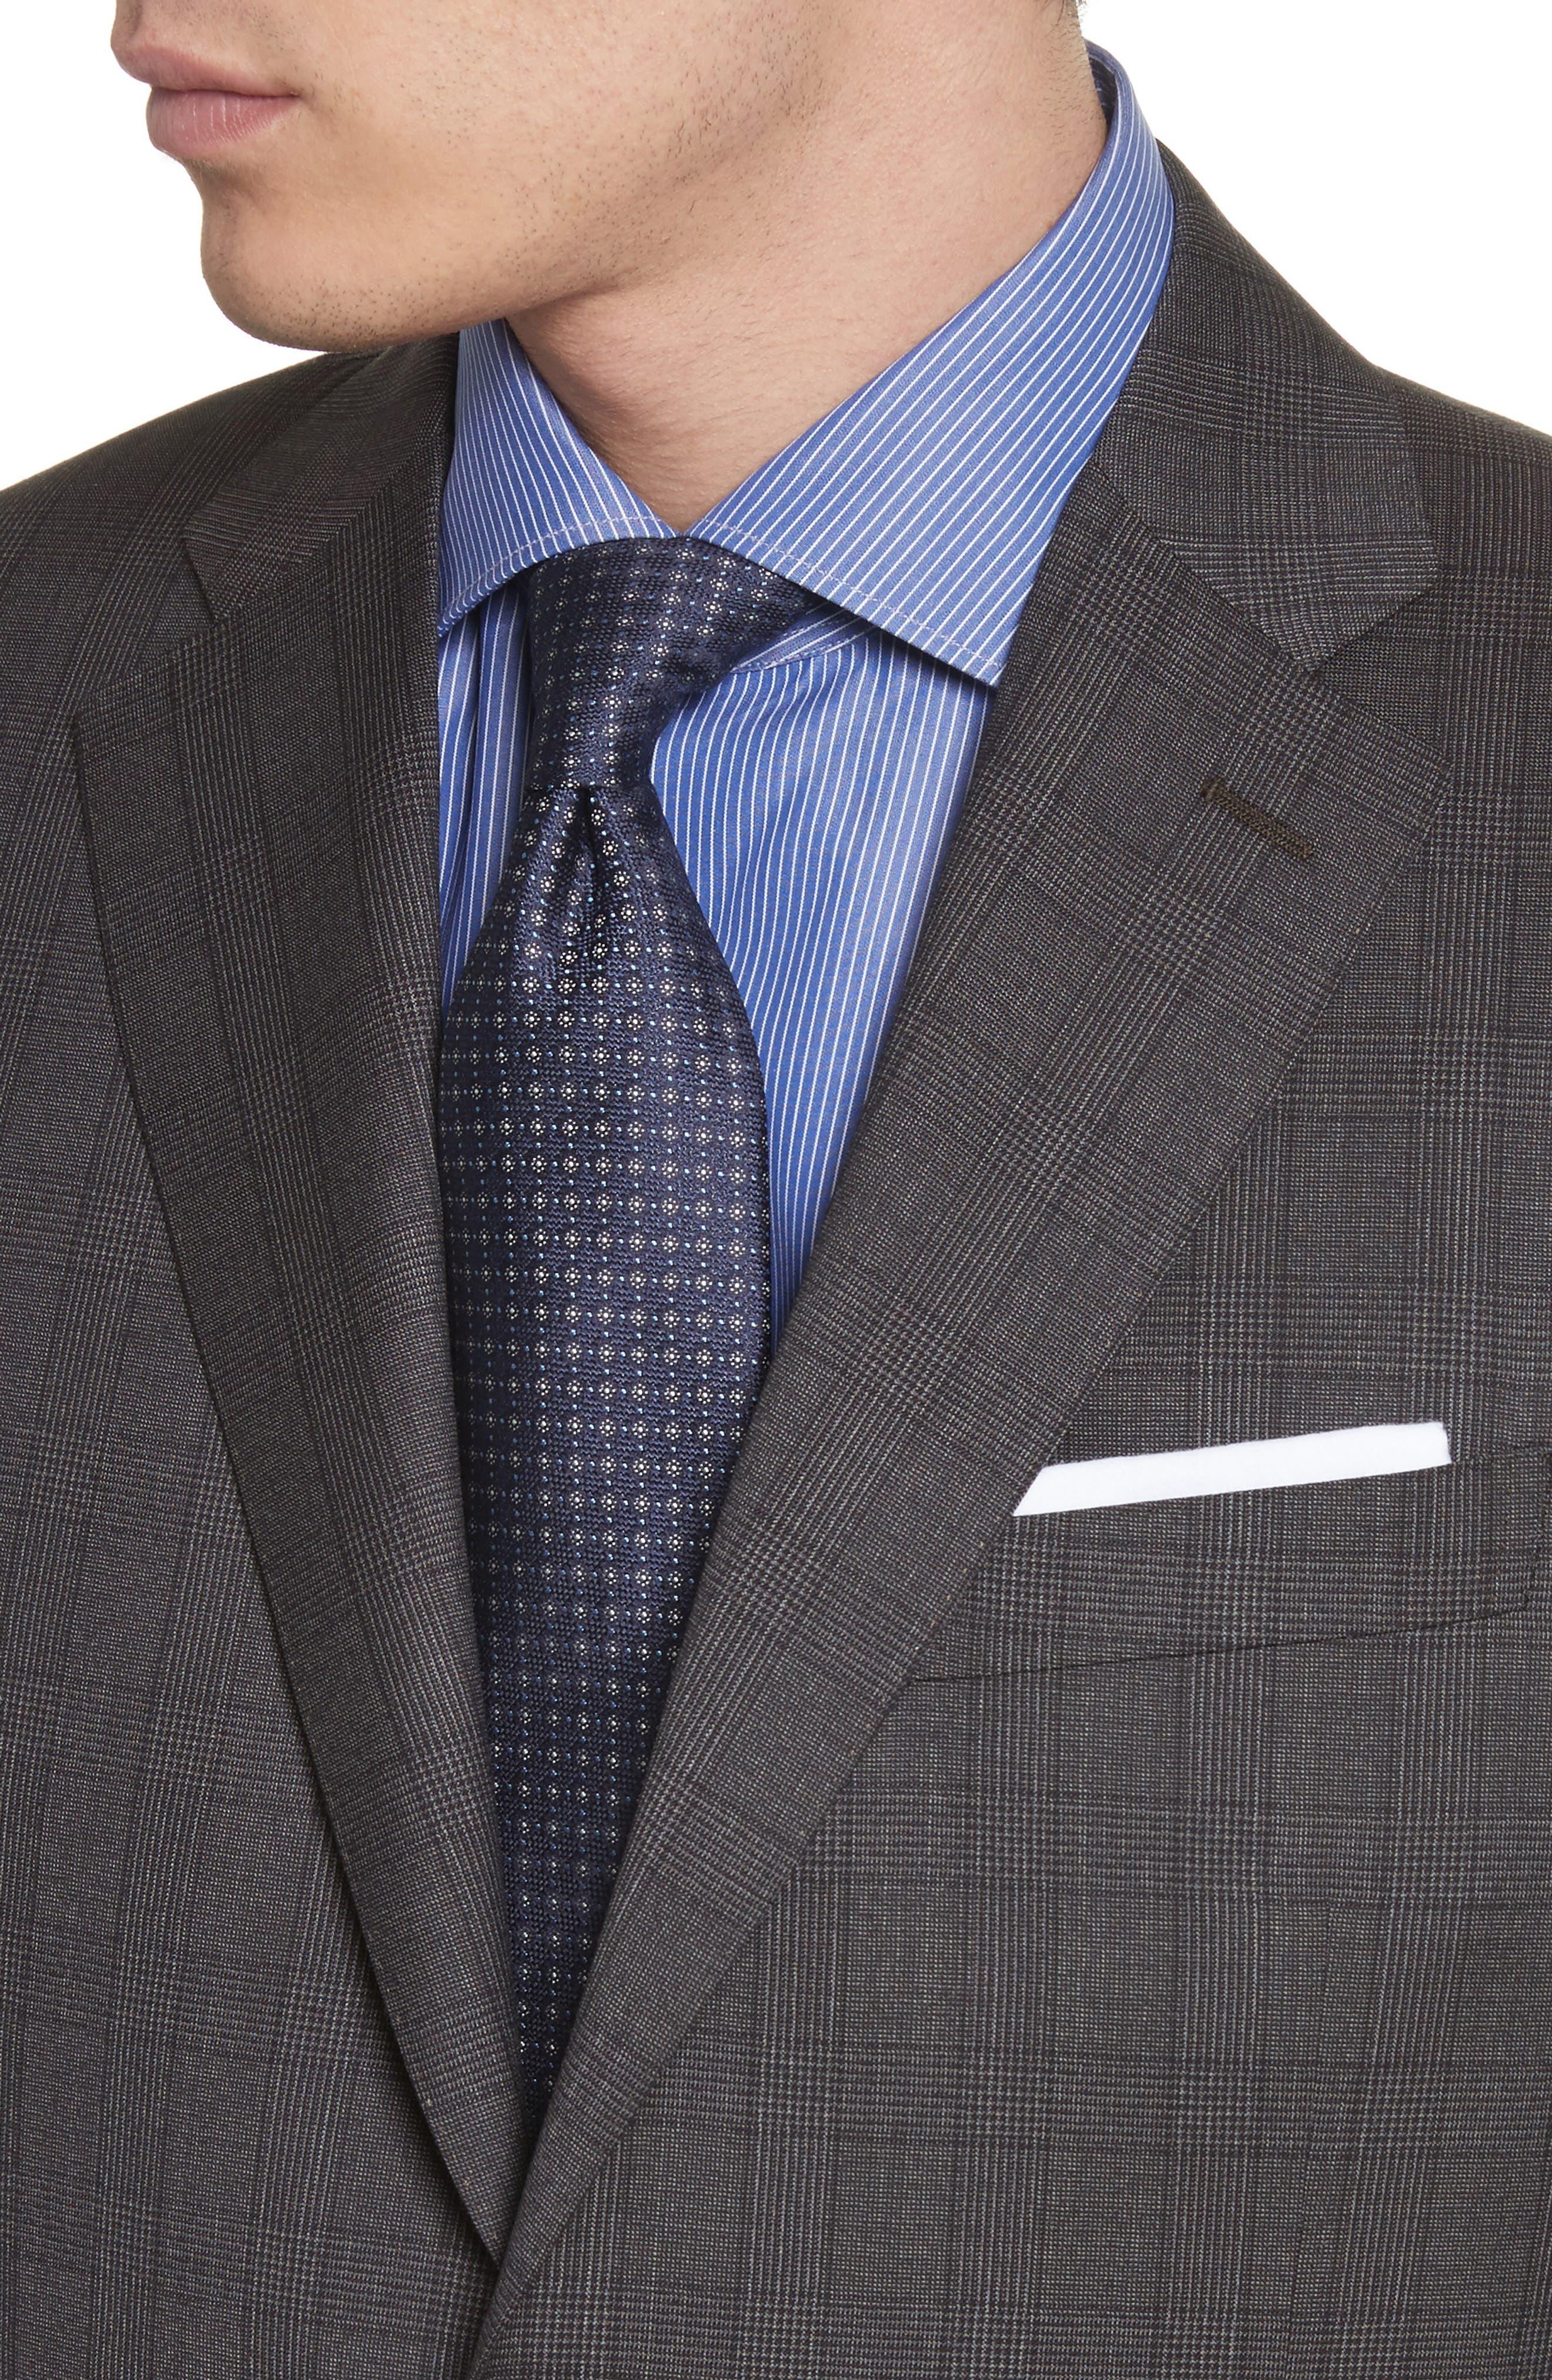 Classic Fit Plaid Wool Suit,                             Alternate thumbnail 4, color,                             Brown